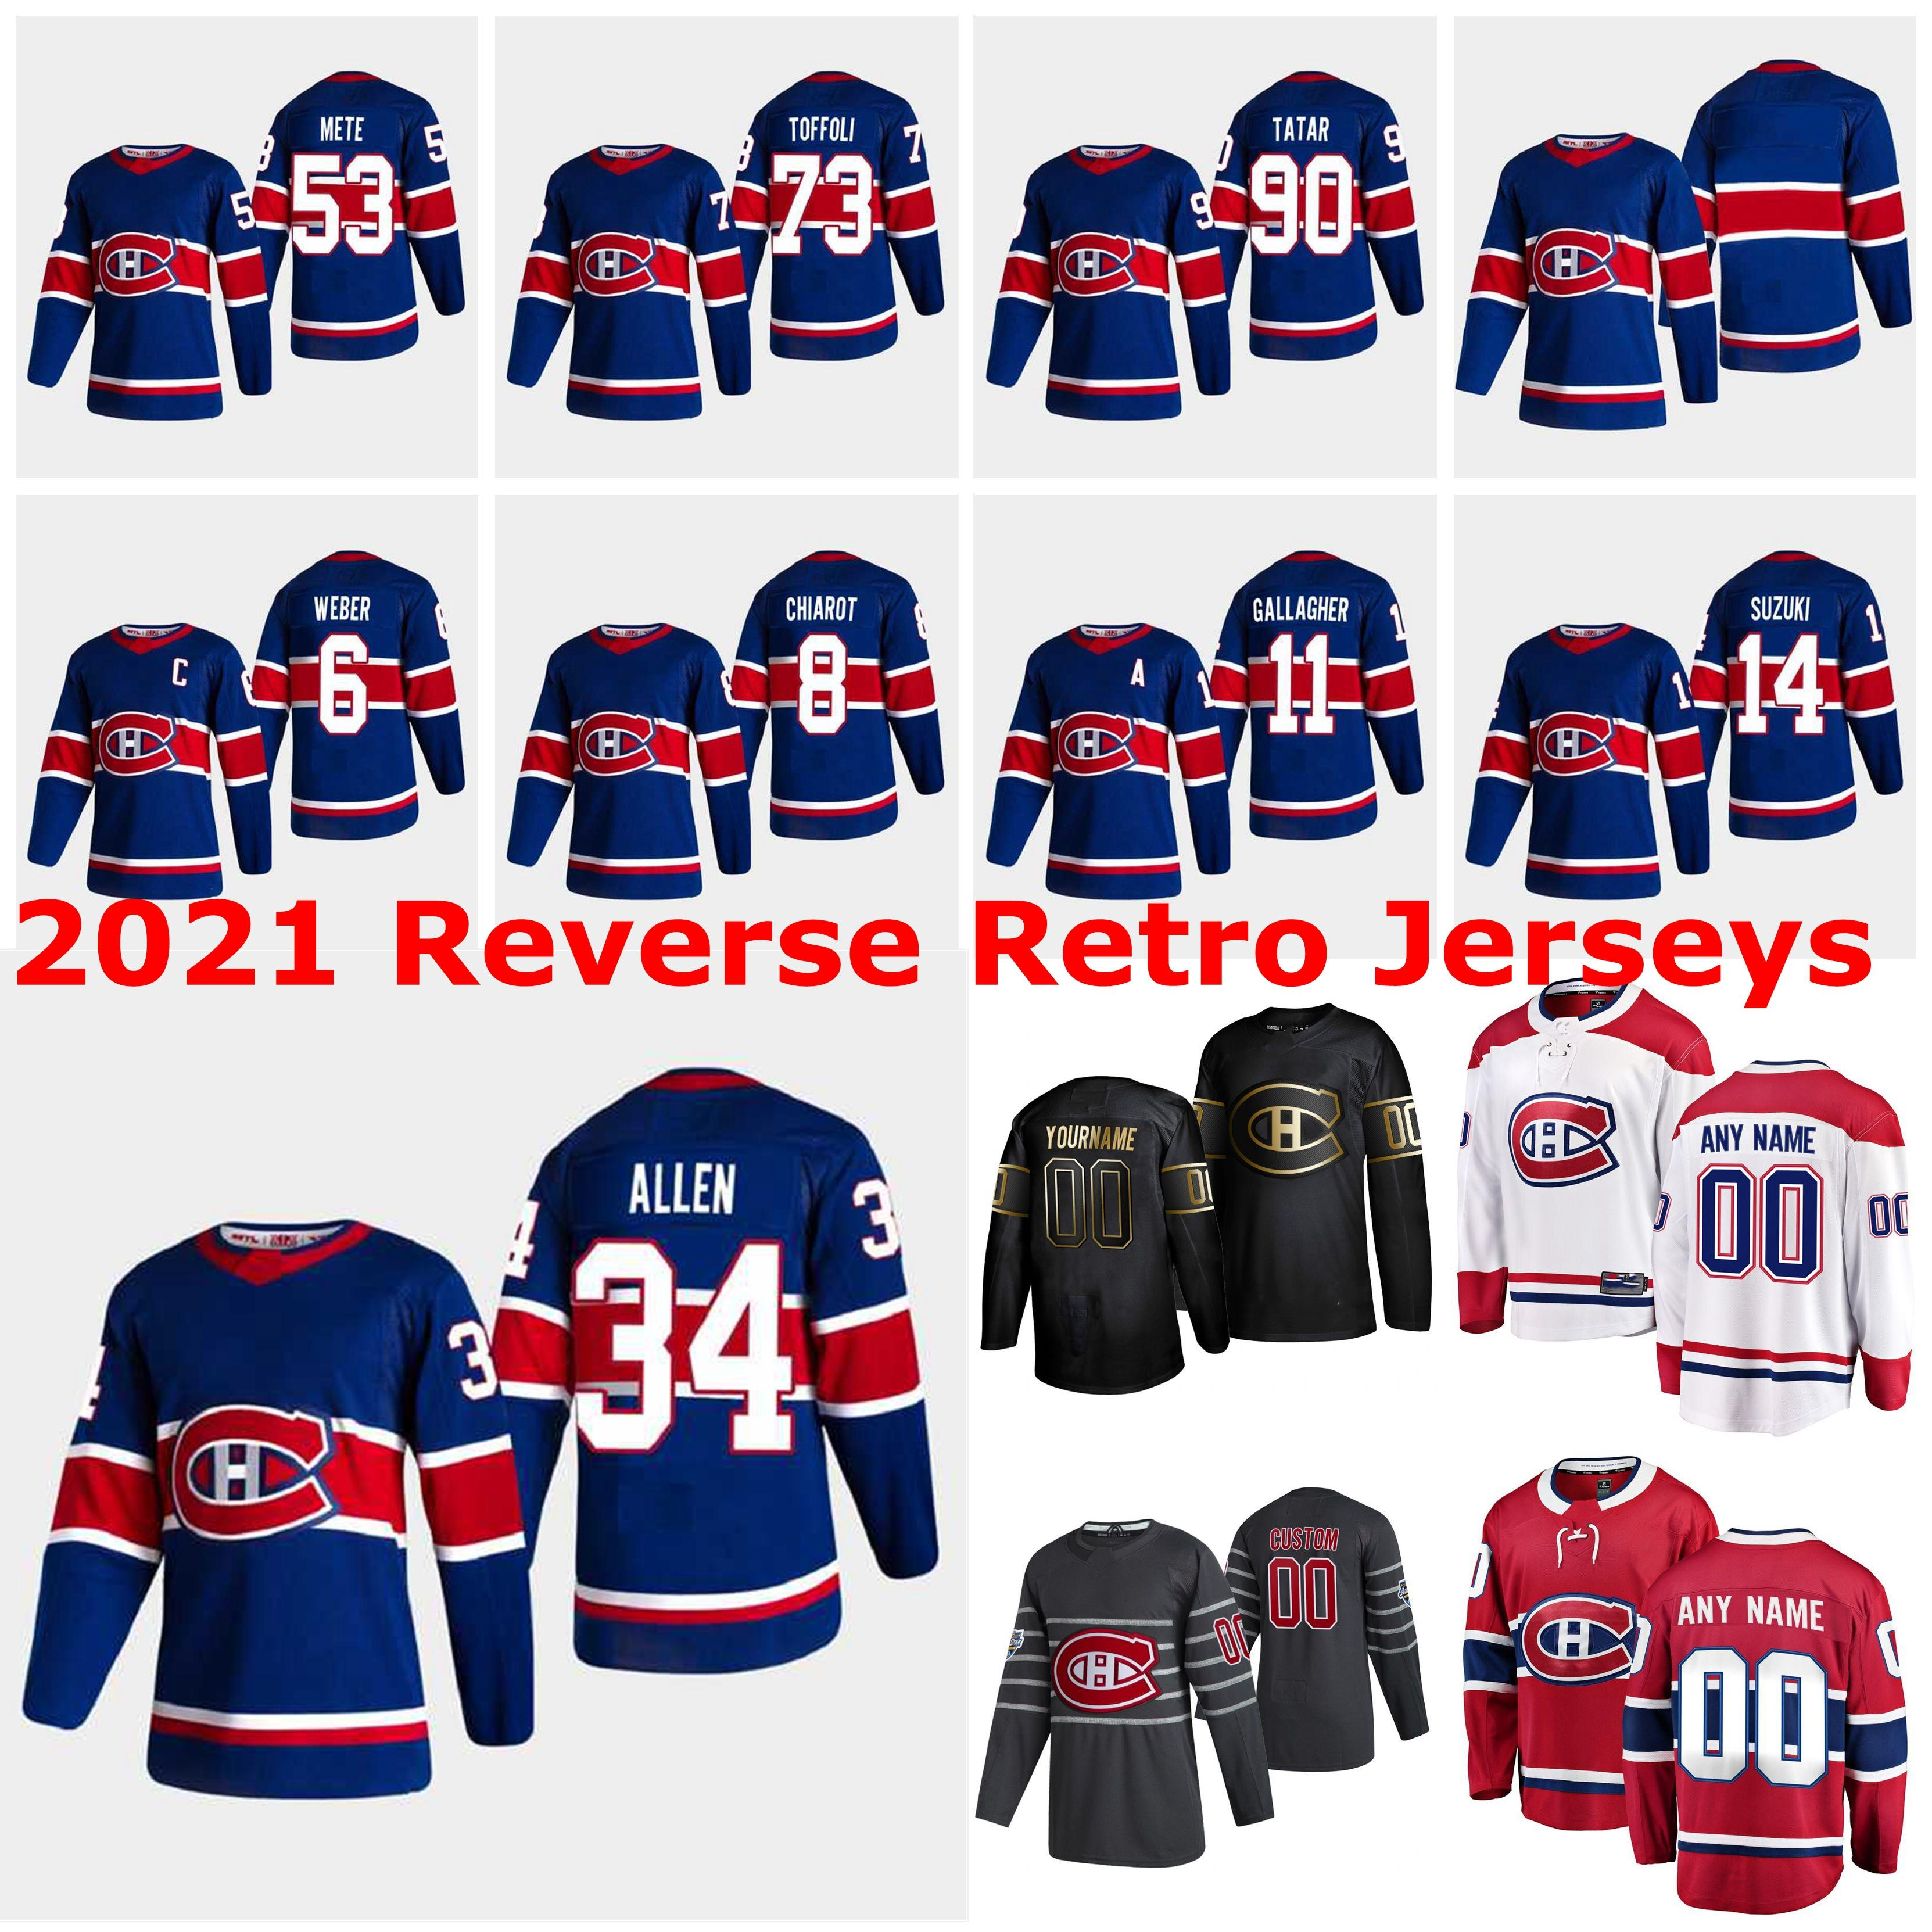 Montreal Canadiens 2021 Revestimento Retro Jerseys 41 Paul Byron Jersey 21 Nick Cousins 24 Phillip Danault 15 Jesperi Kotkaniemi Costume Costume